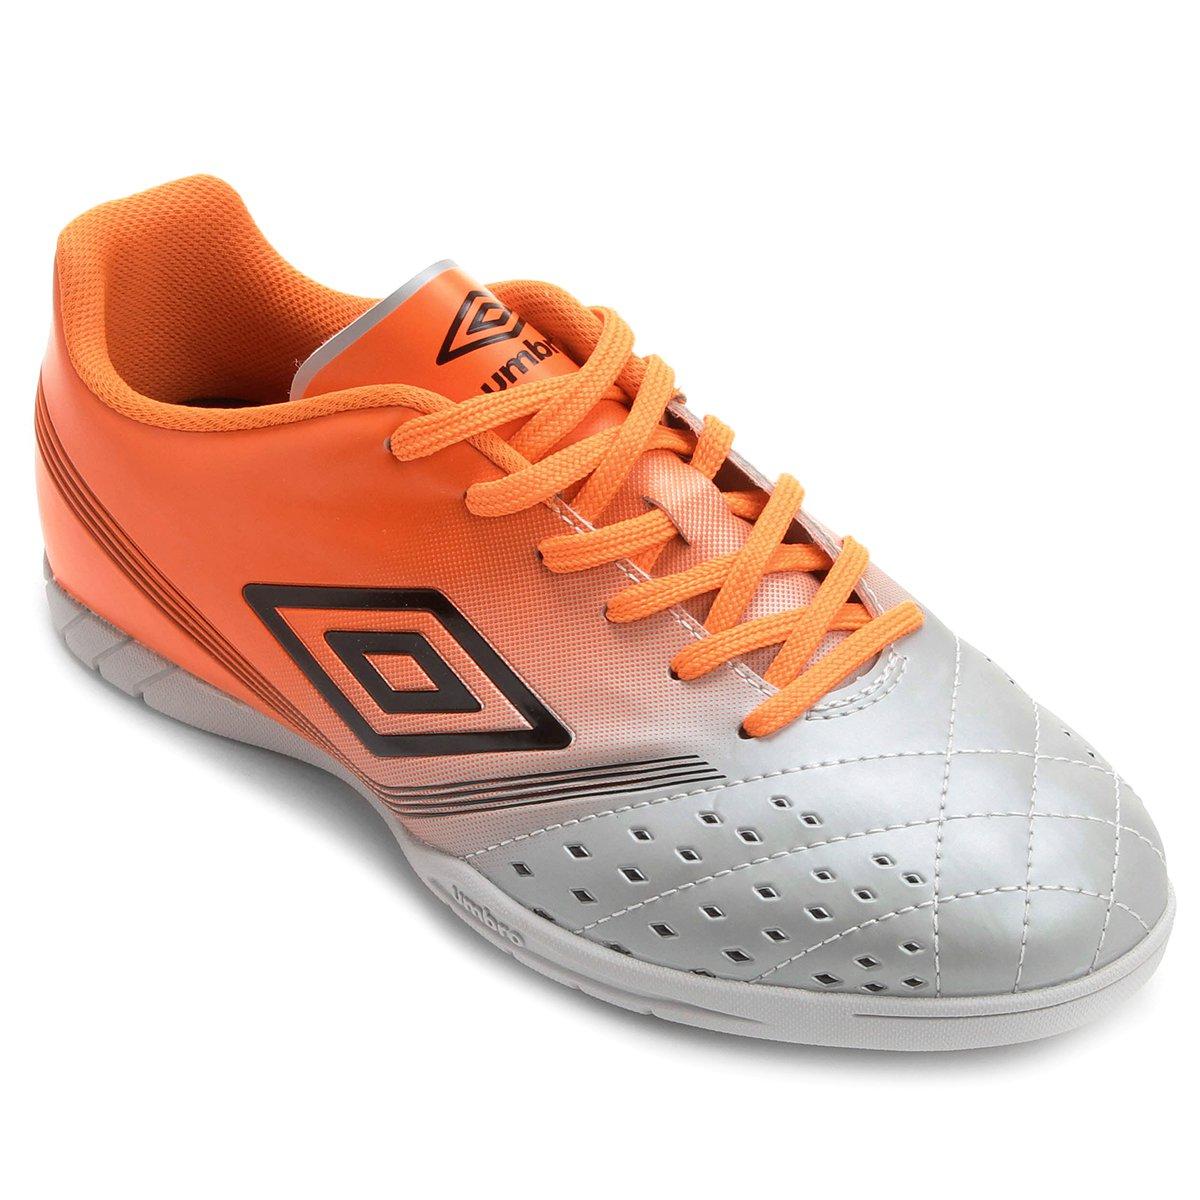 41c2668720879 Chuteira Futsal Umbro Fifty - Compre Agora